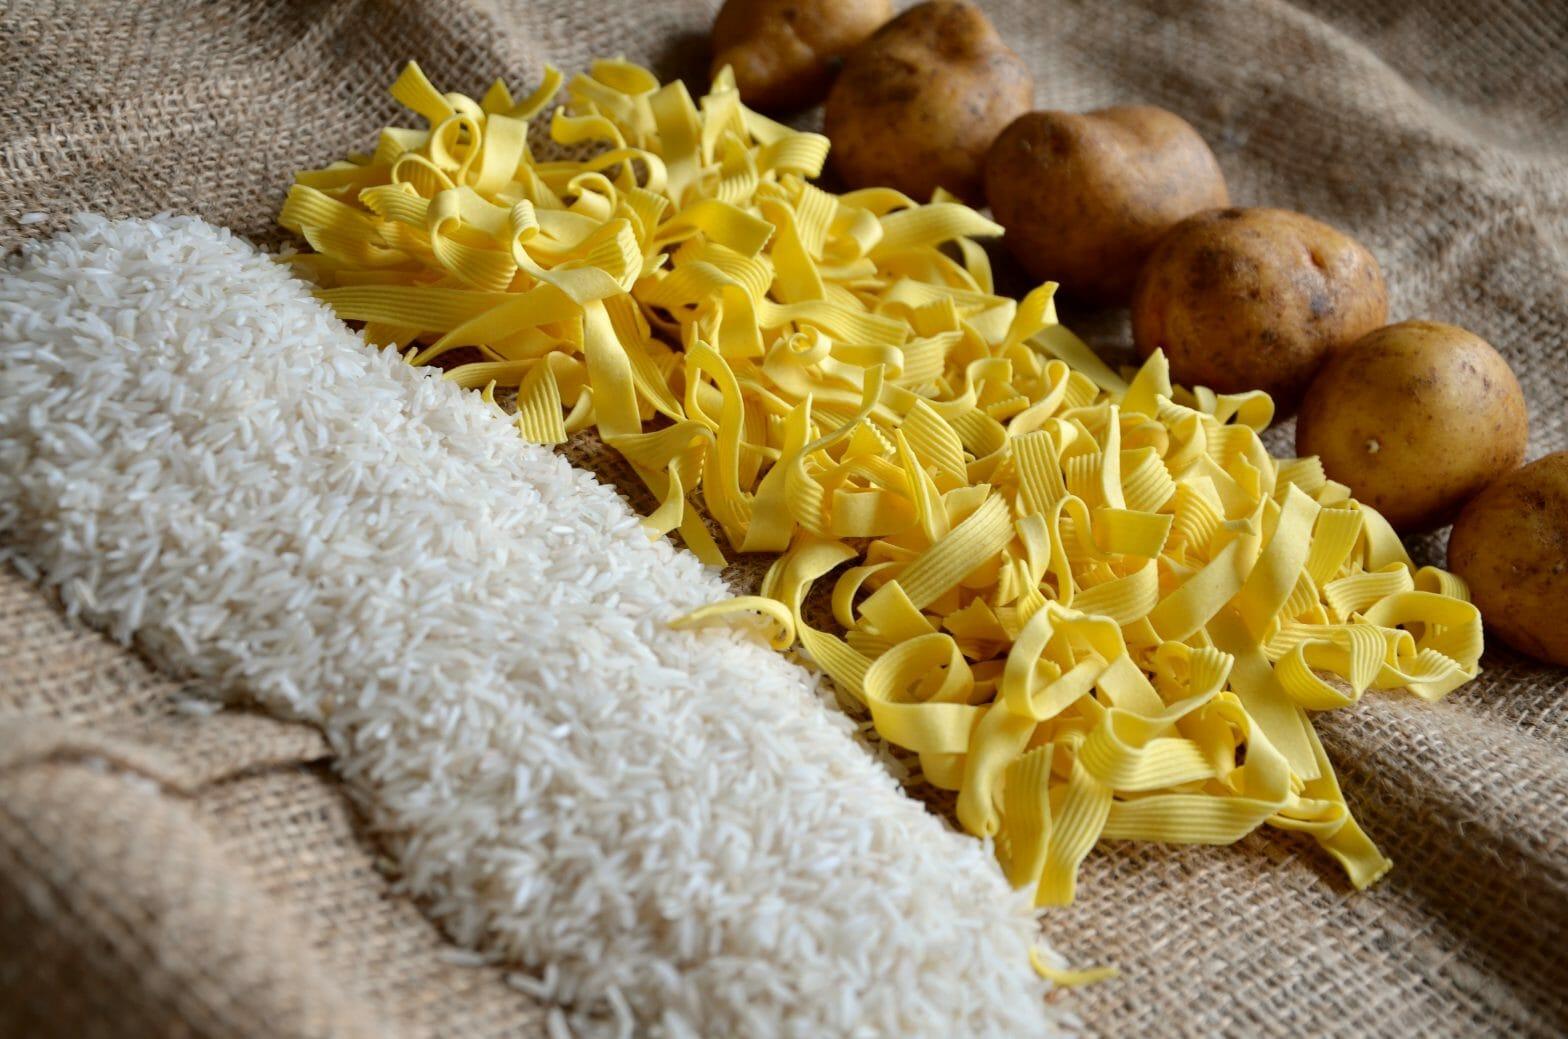 noodles-rice-potatoes-food-46280-1568x1039